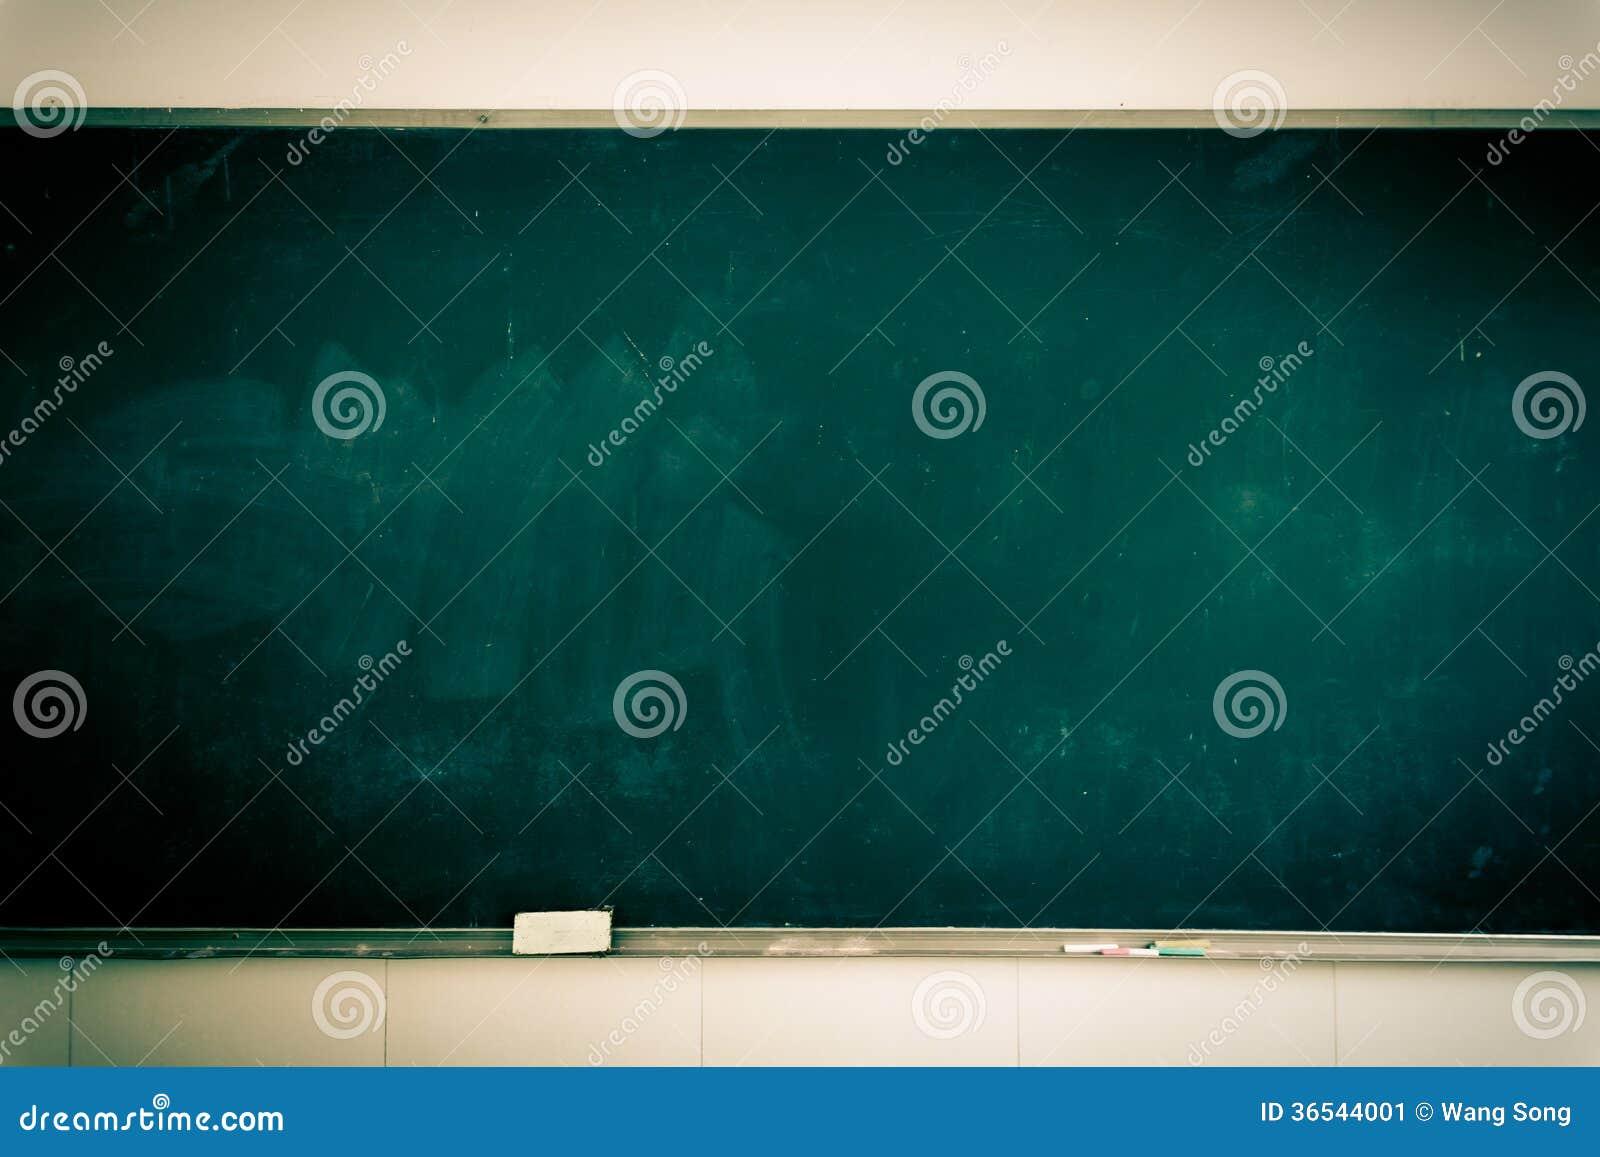 Classroom Blackboard Design ~ Classroom blackboard stock image